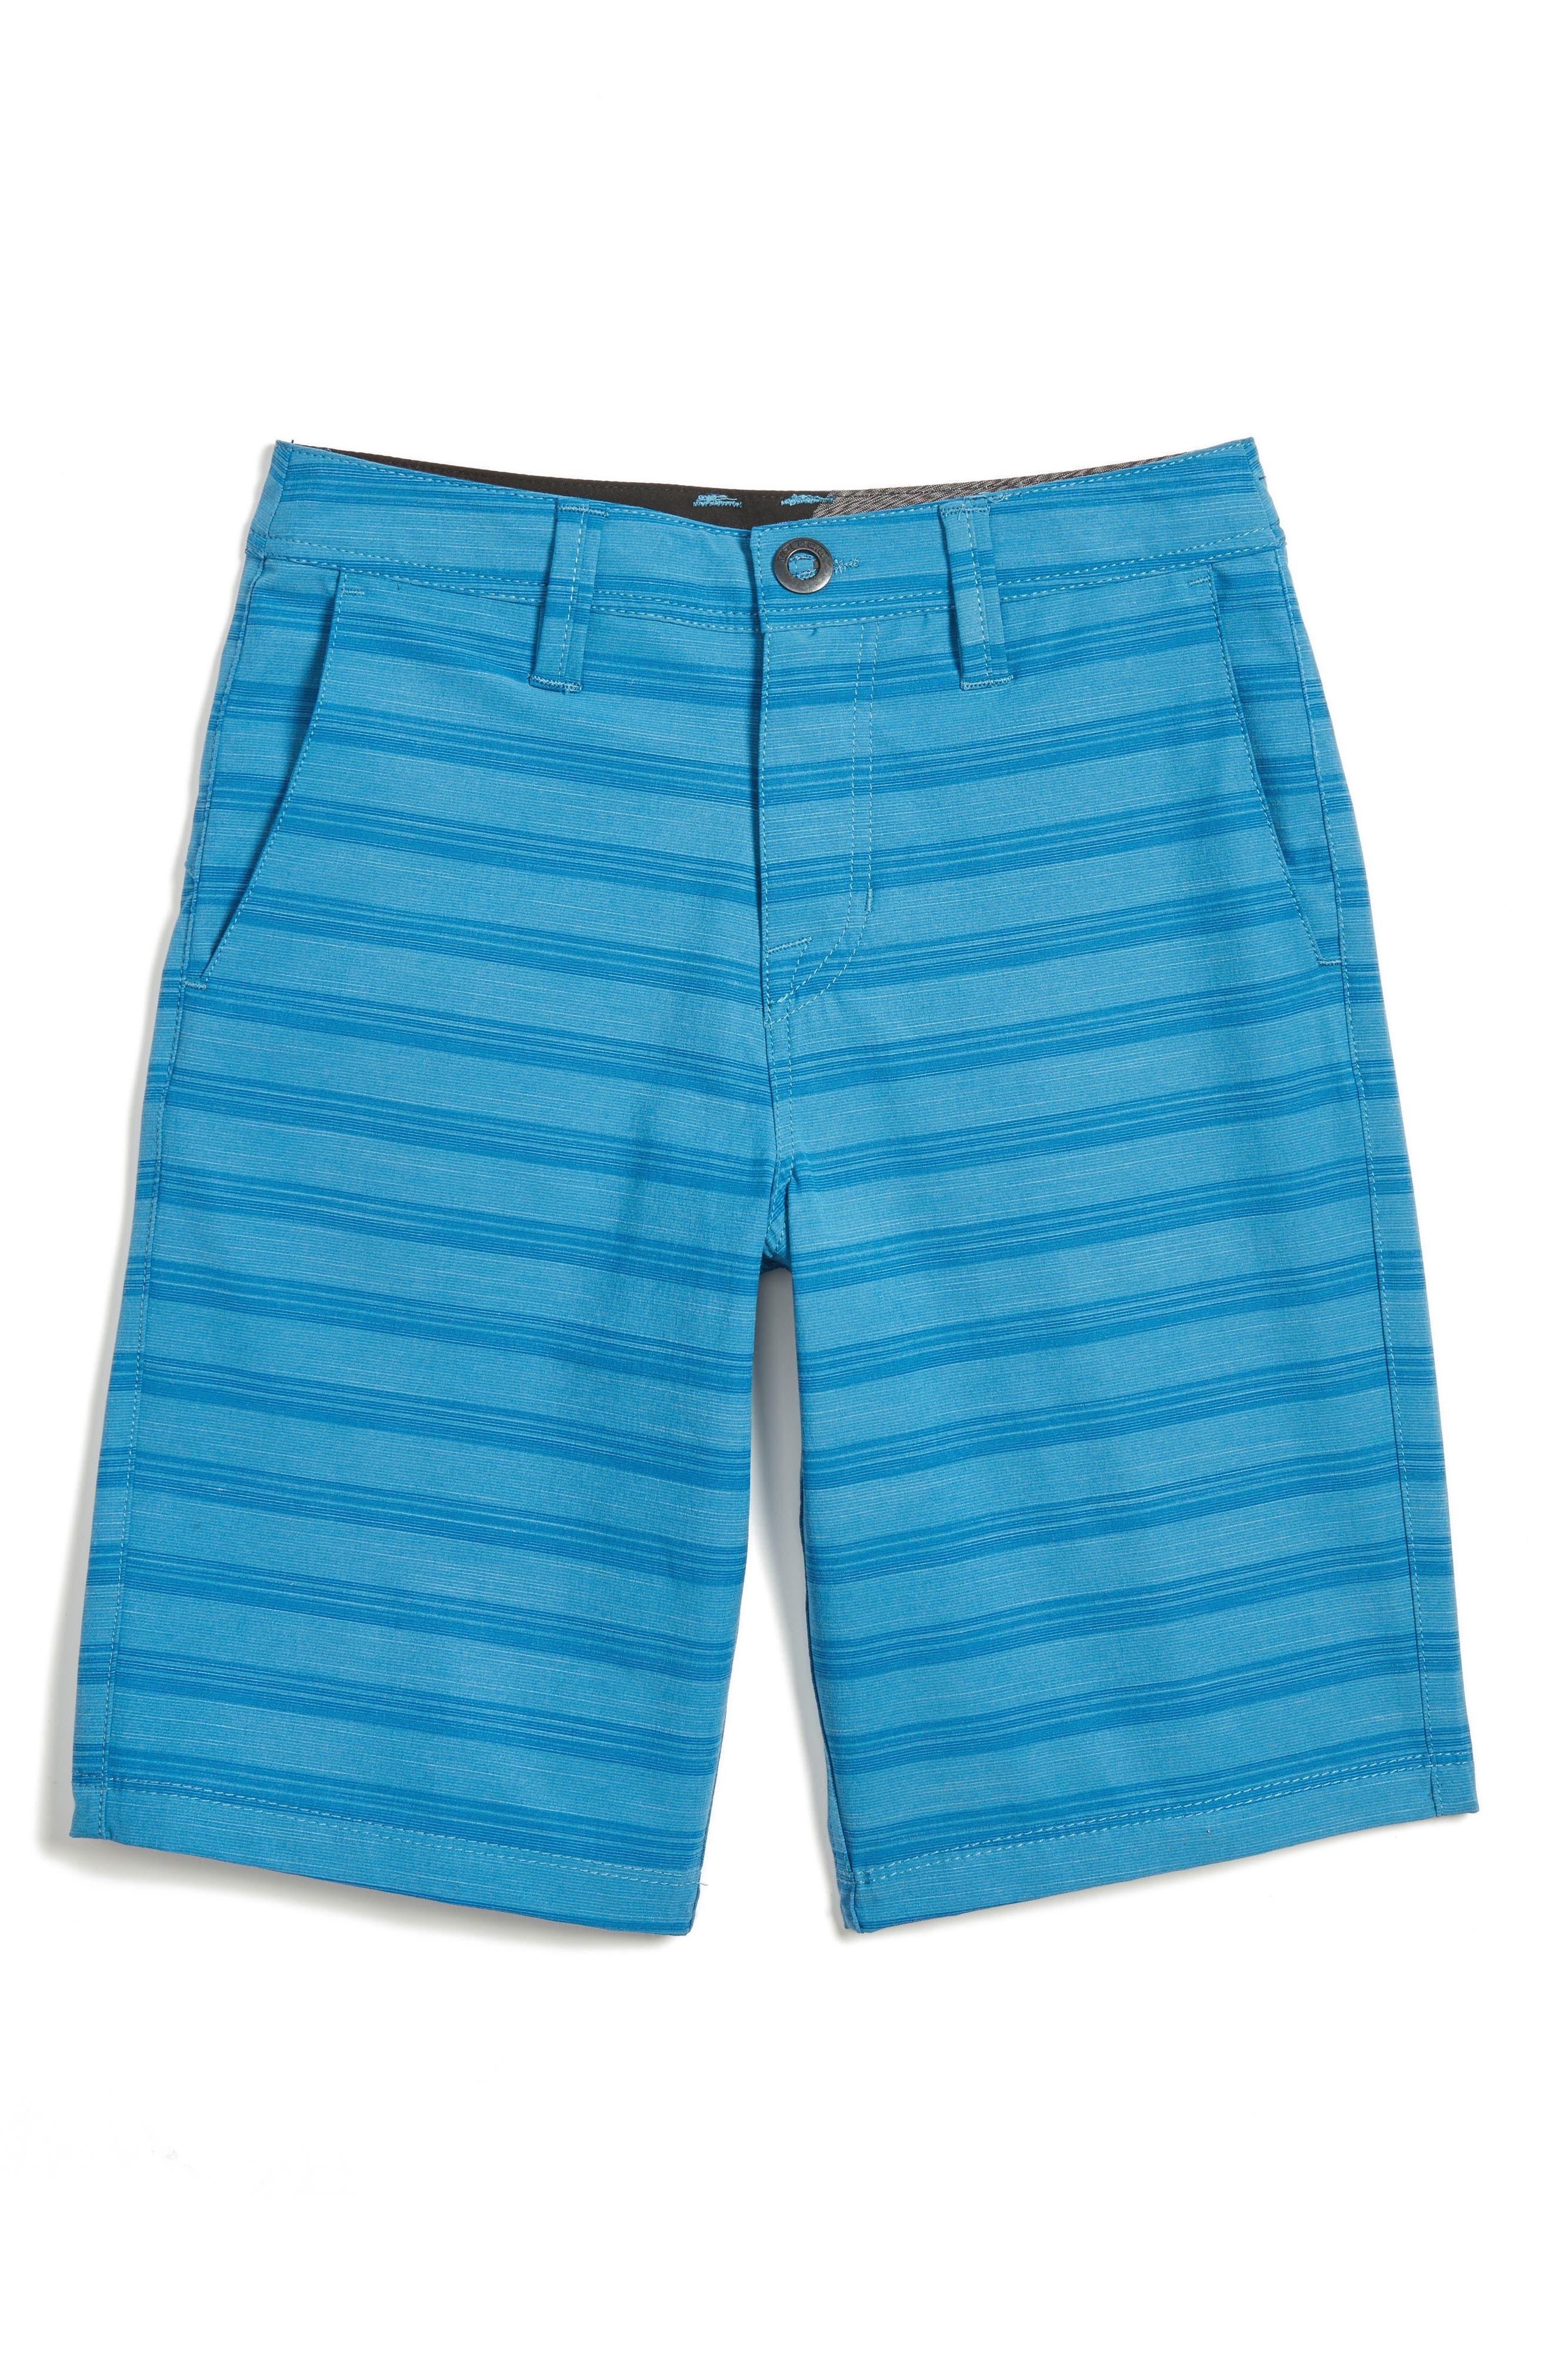 Surf N' Turf Hybrid Shorts,                         Main,                         color, Mayan Blue